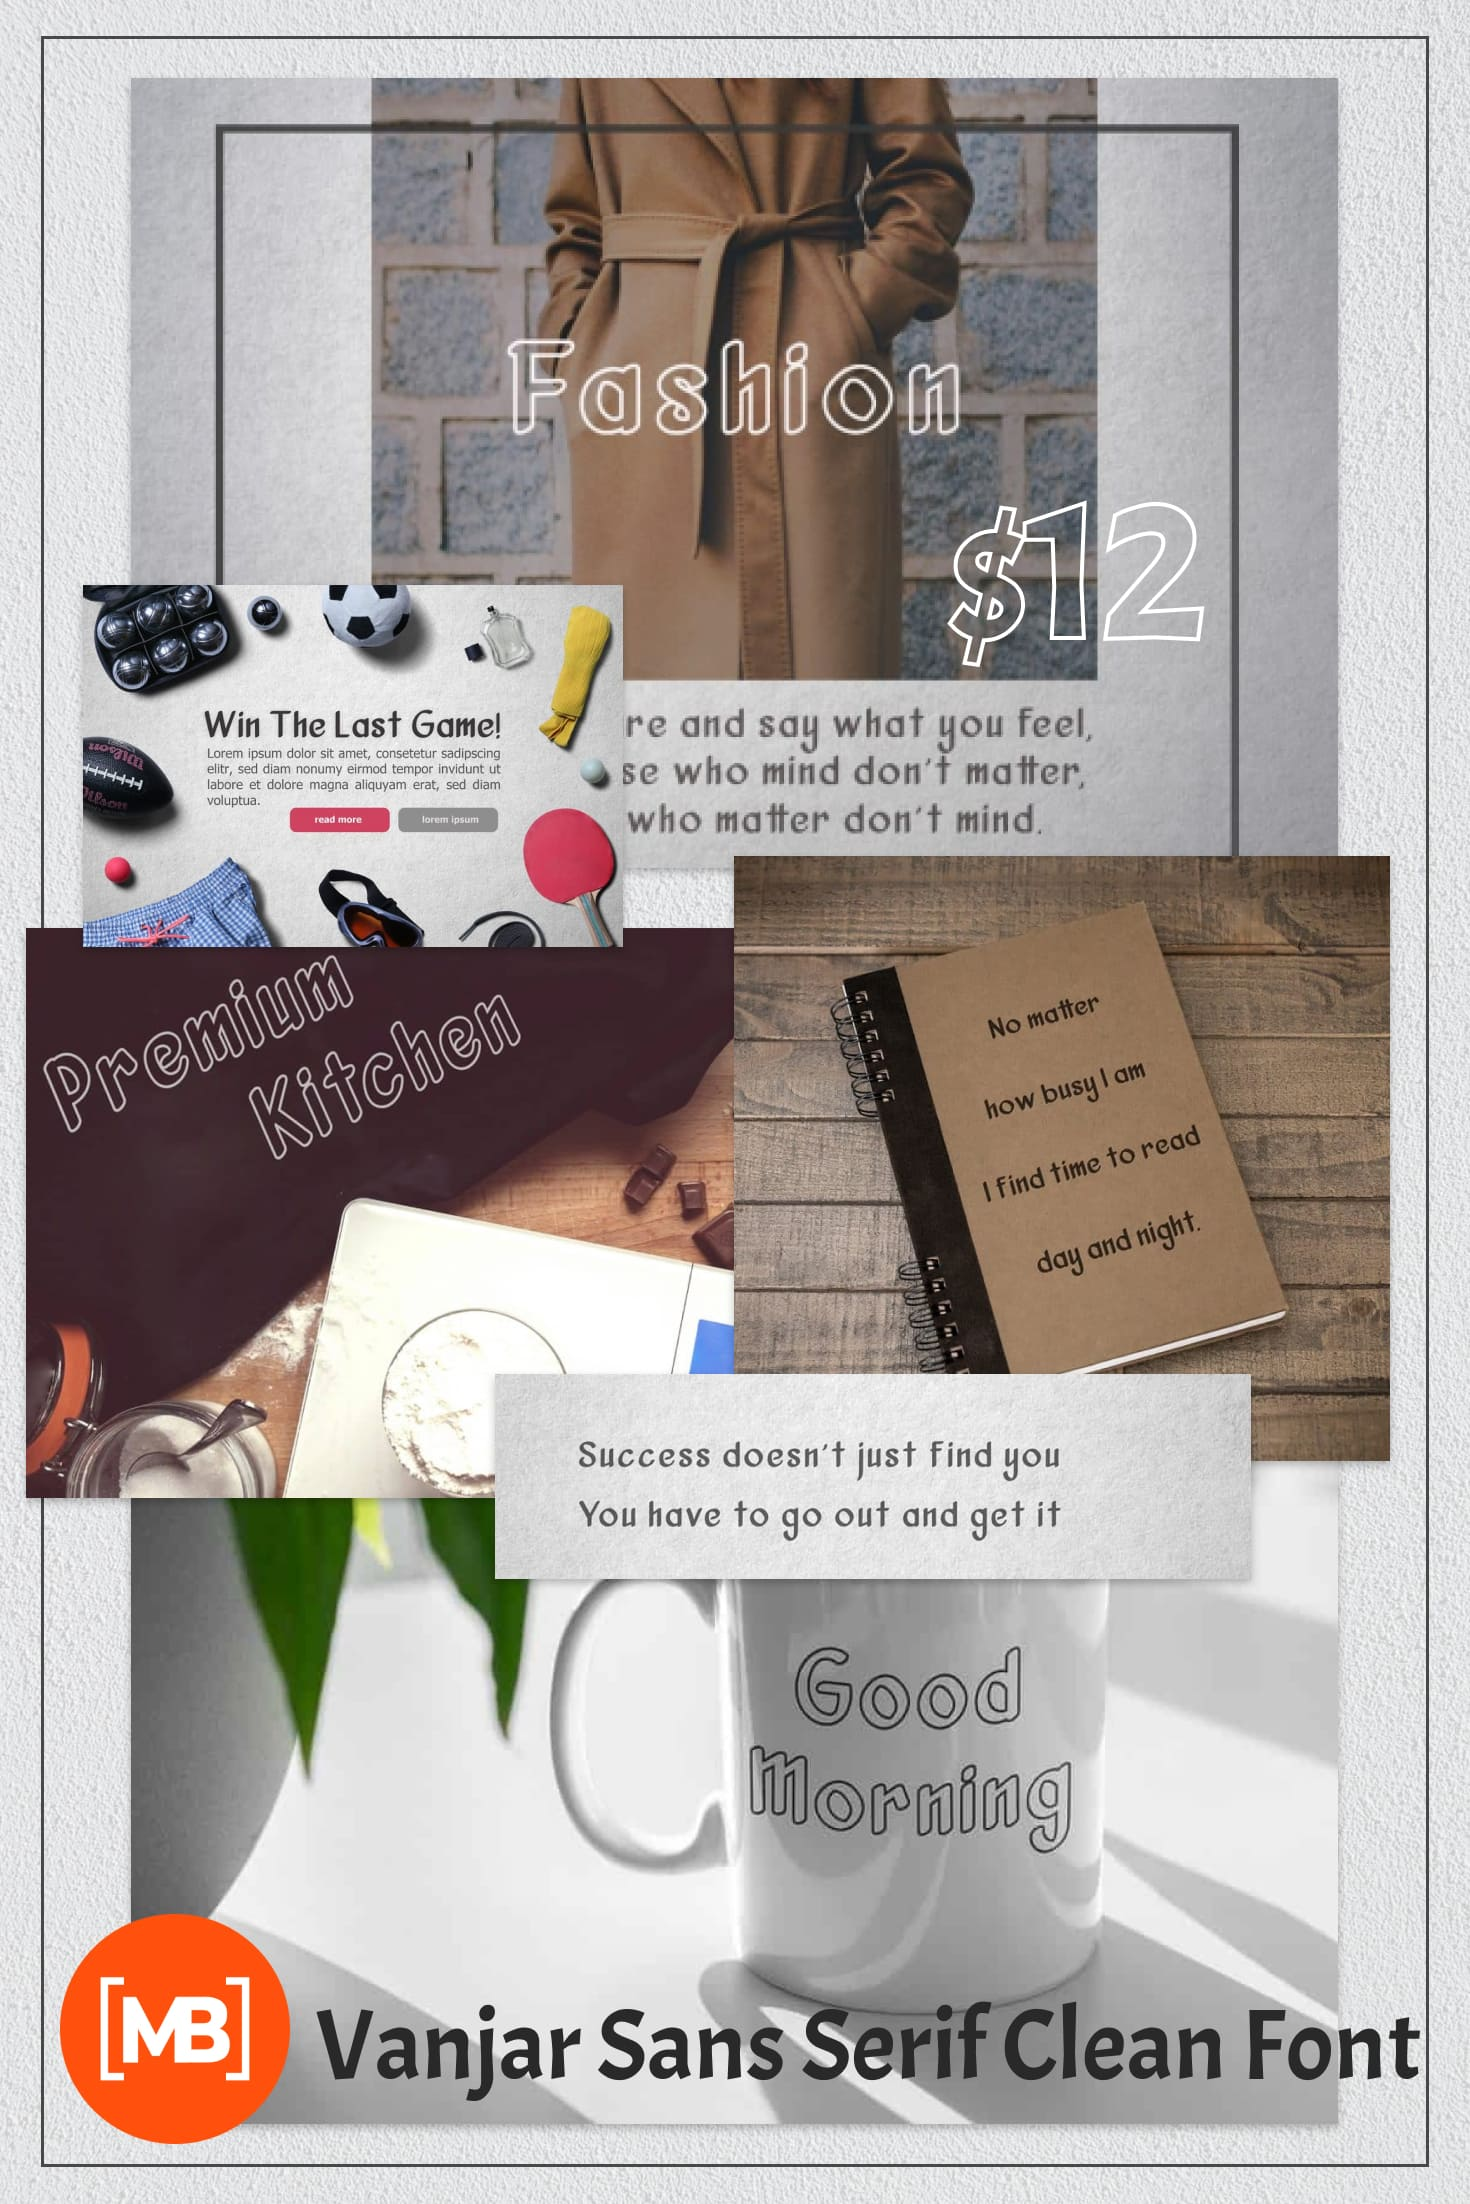 Pinterest Image: Vanjar Sans Serif Clean Font.